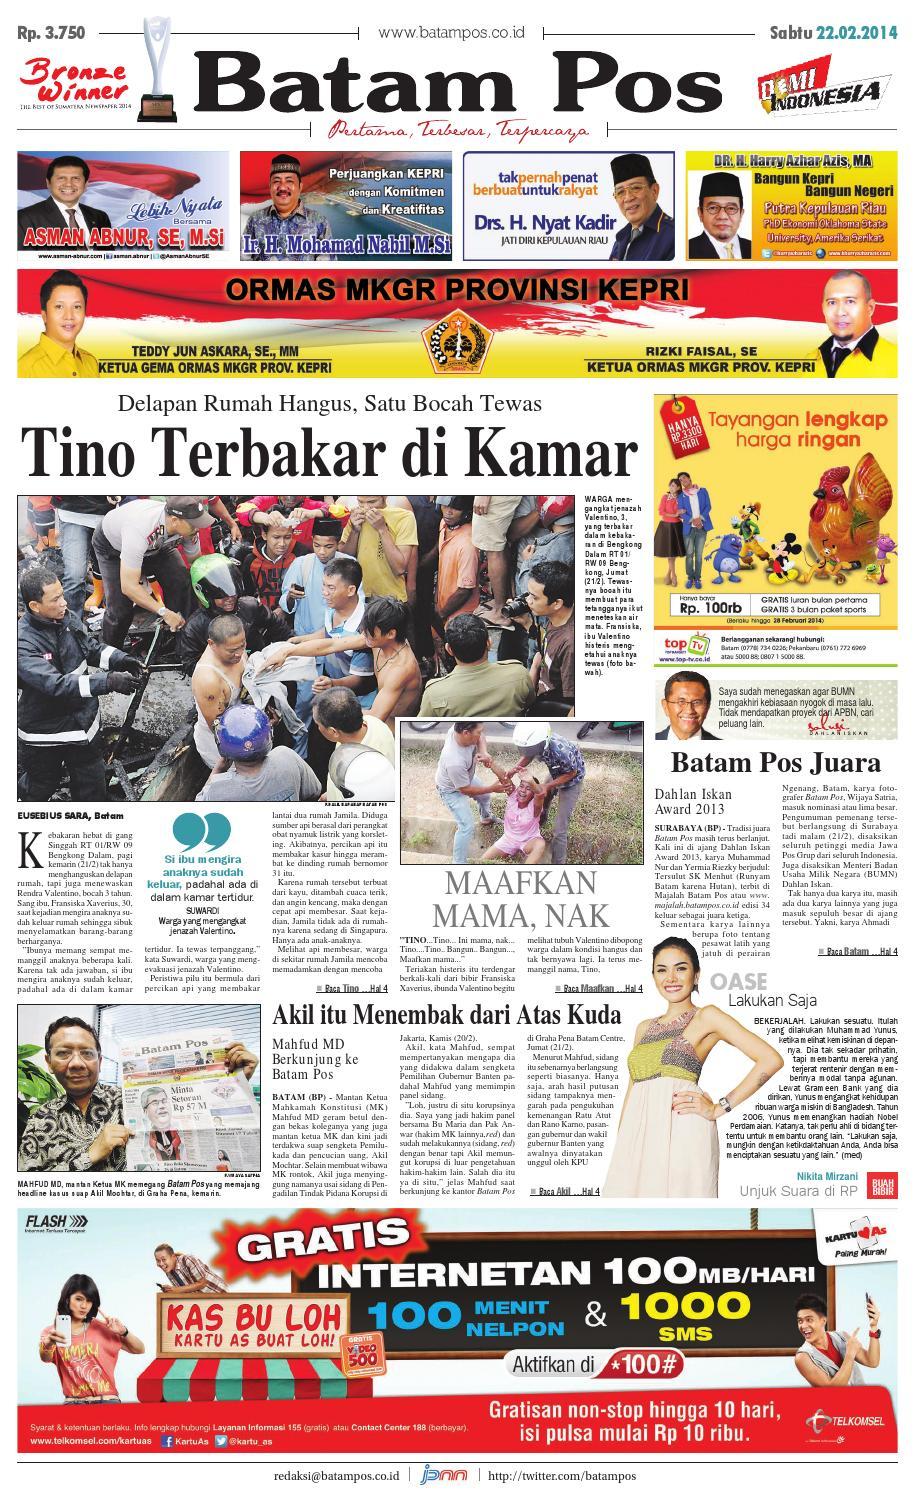 22 Februari 2014 By Batampos Newspaper Issuu Voucher Deposit Finza Cell 1jt